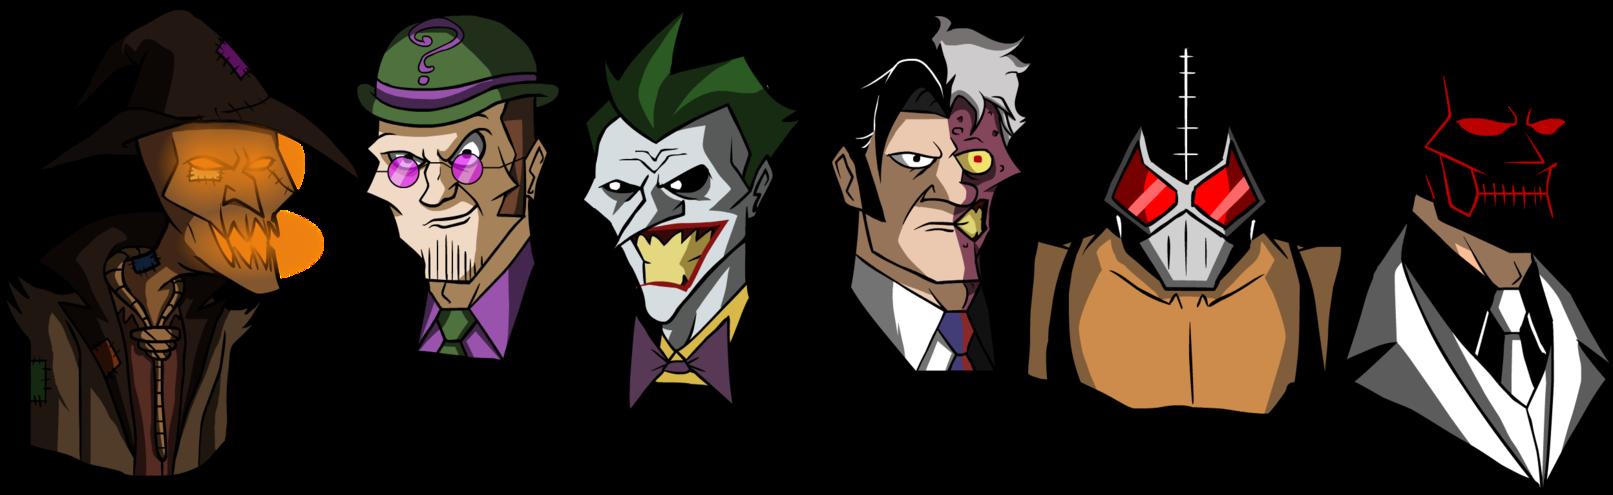 1613x495 Batman Villains In My Own Cartoon Style By Glenorsven